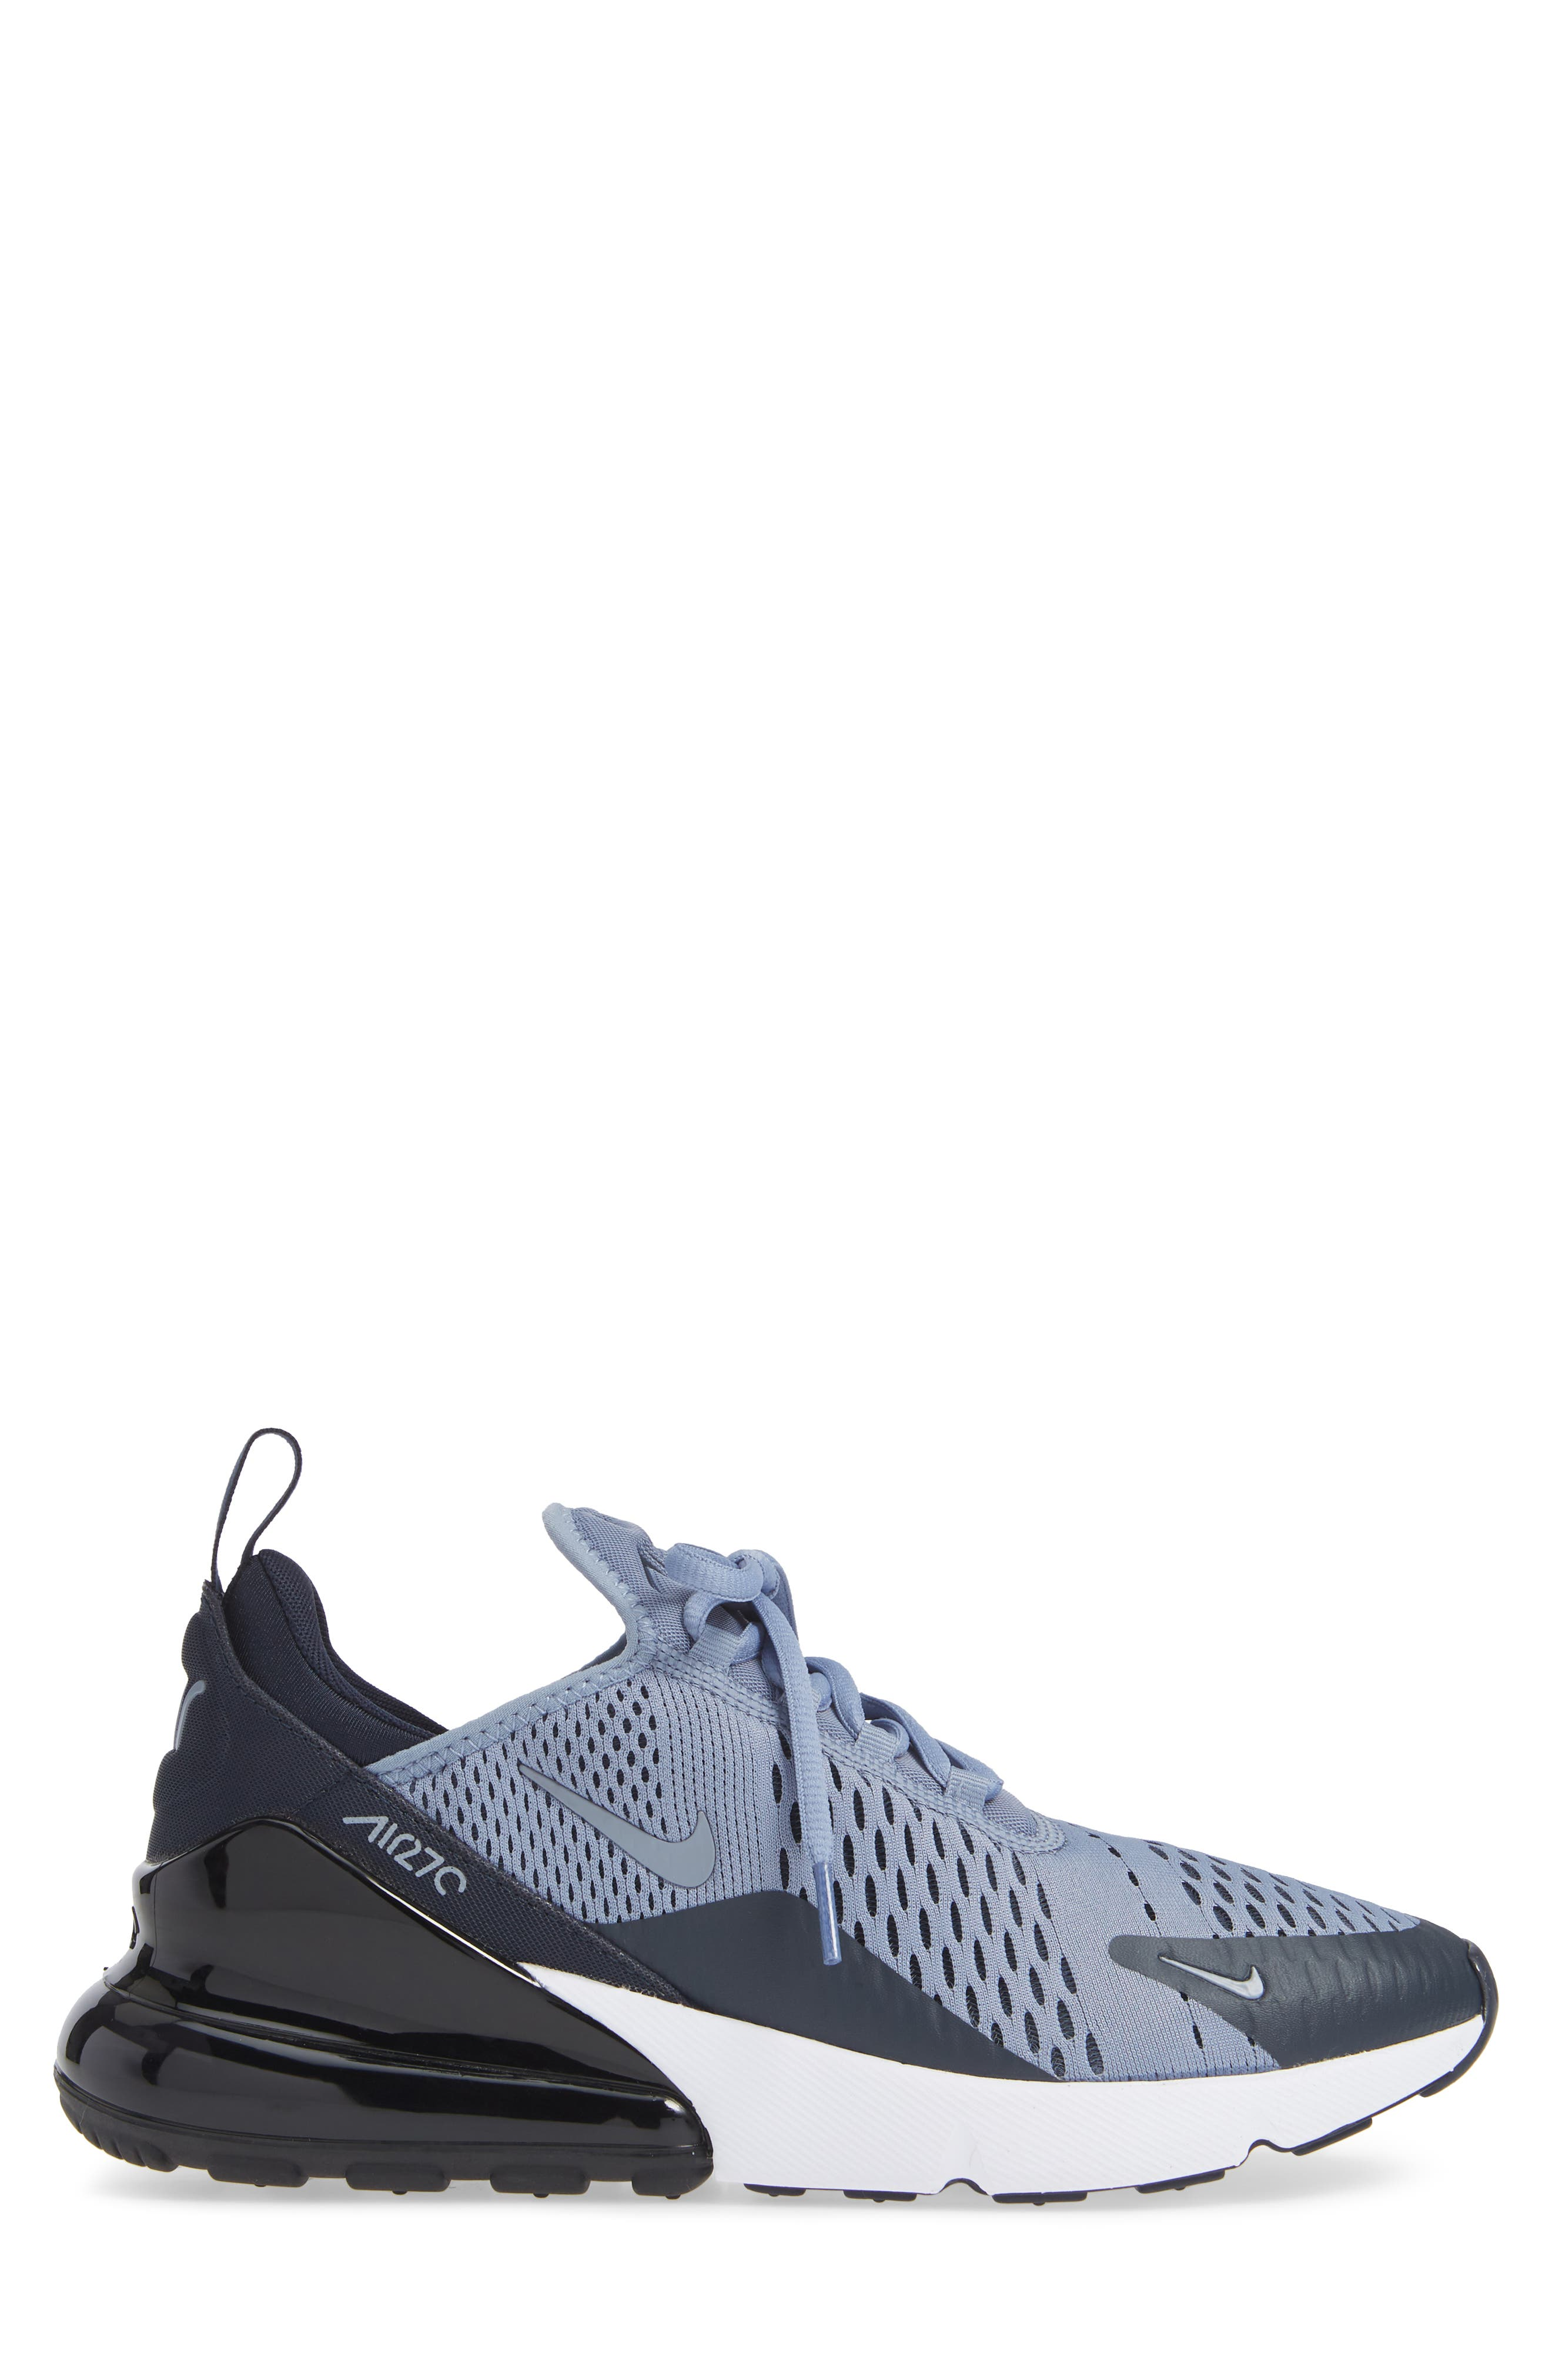 Air Max 270 Sneaker,                             Alternate thumbnail 3, color,                             ASHEN SLATE/ BLACK